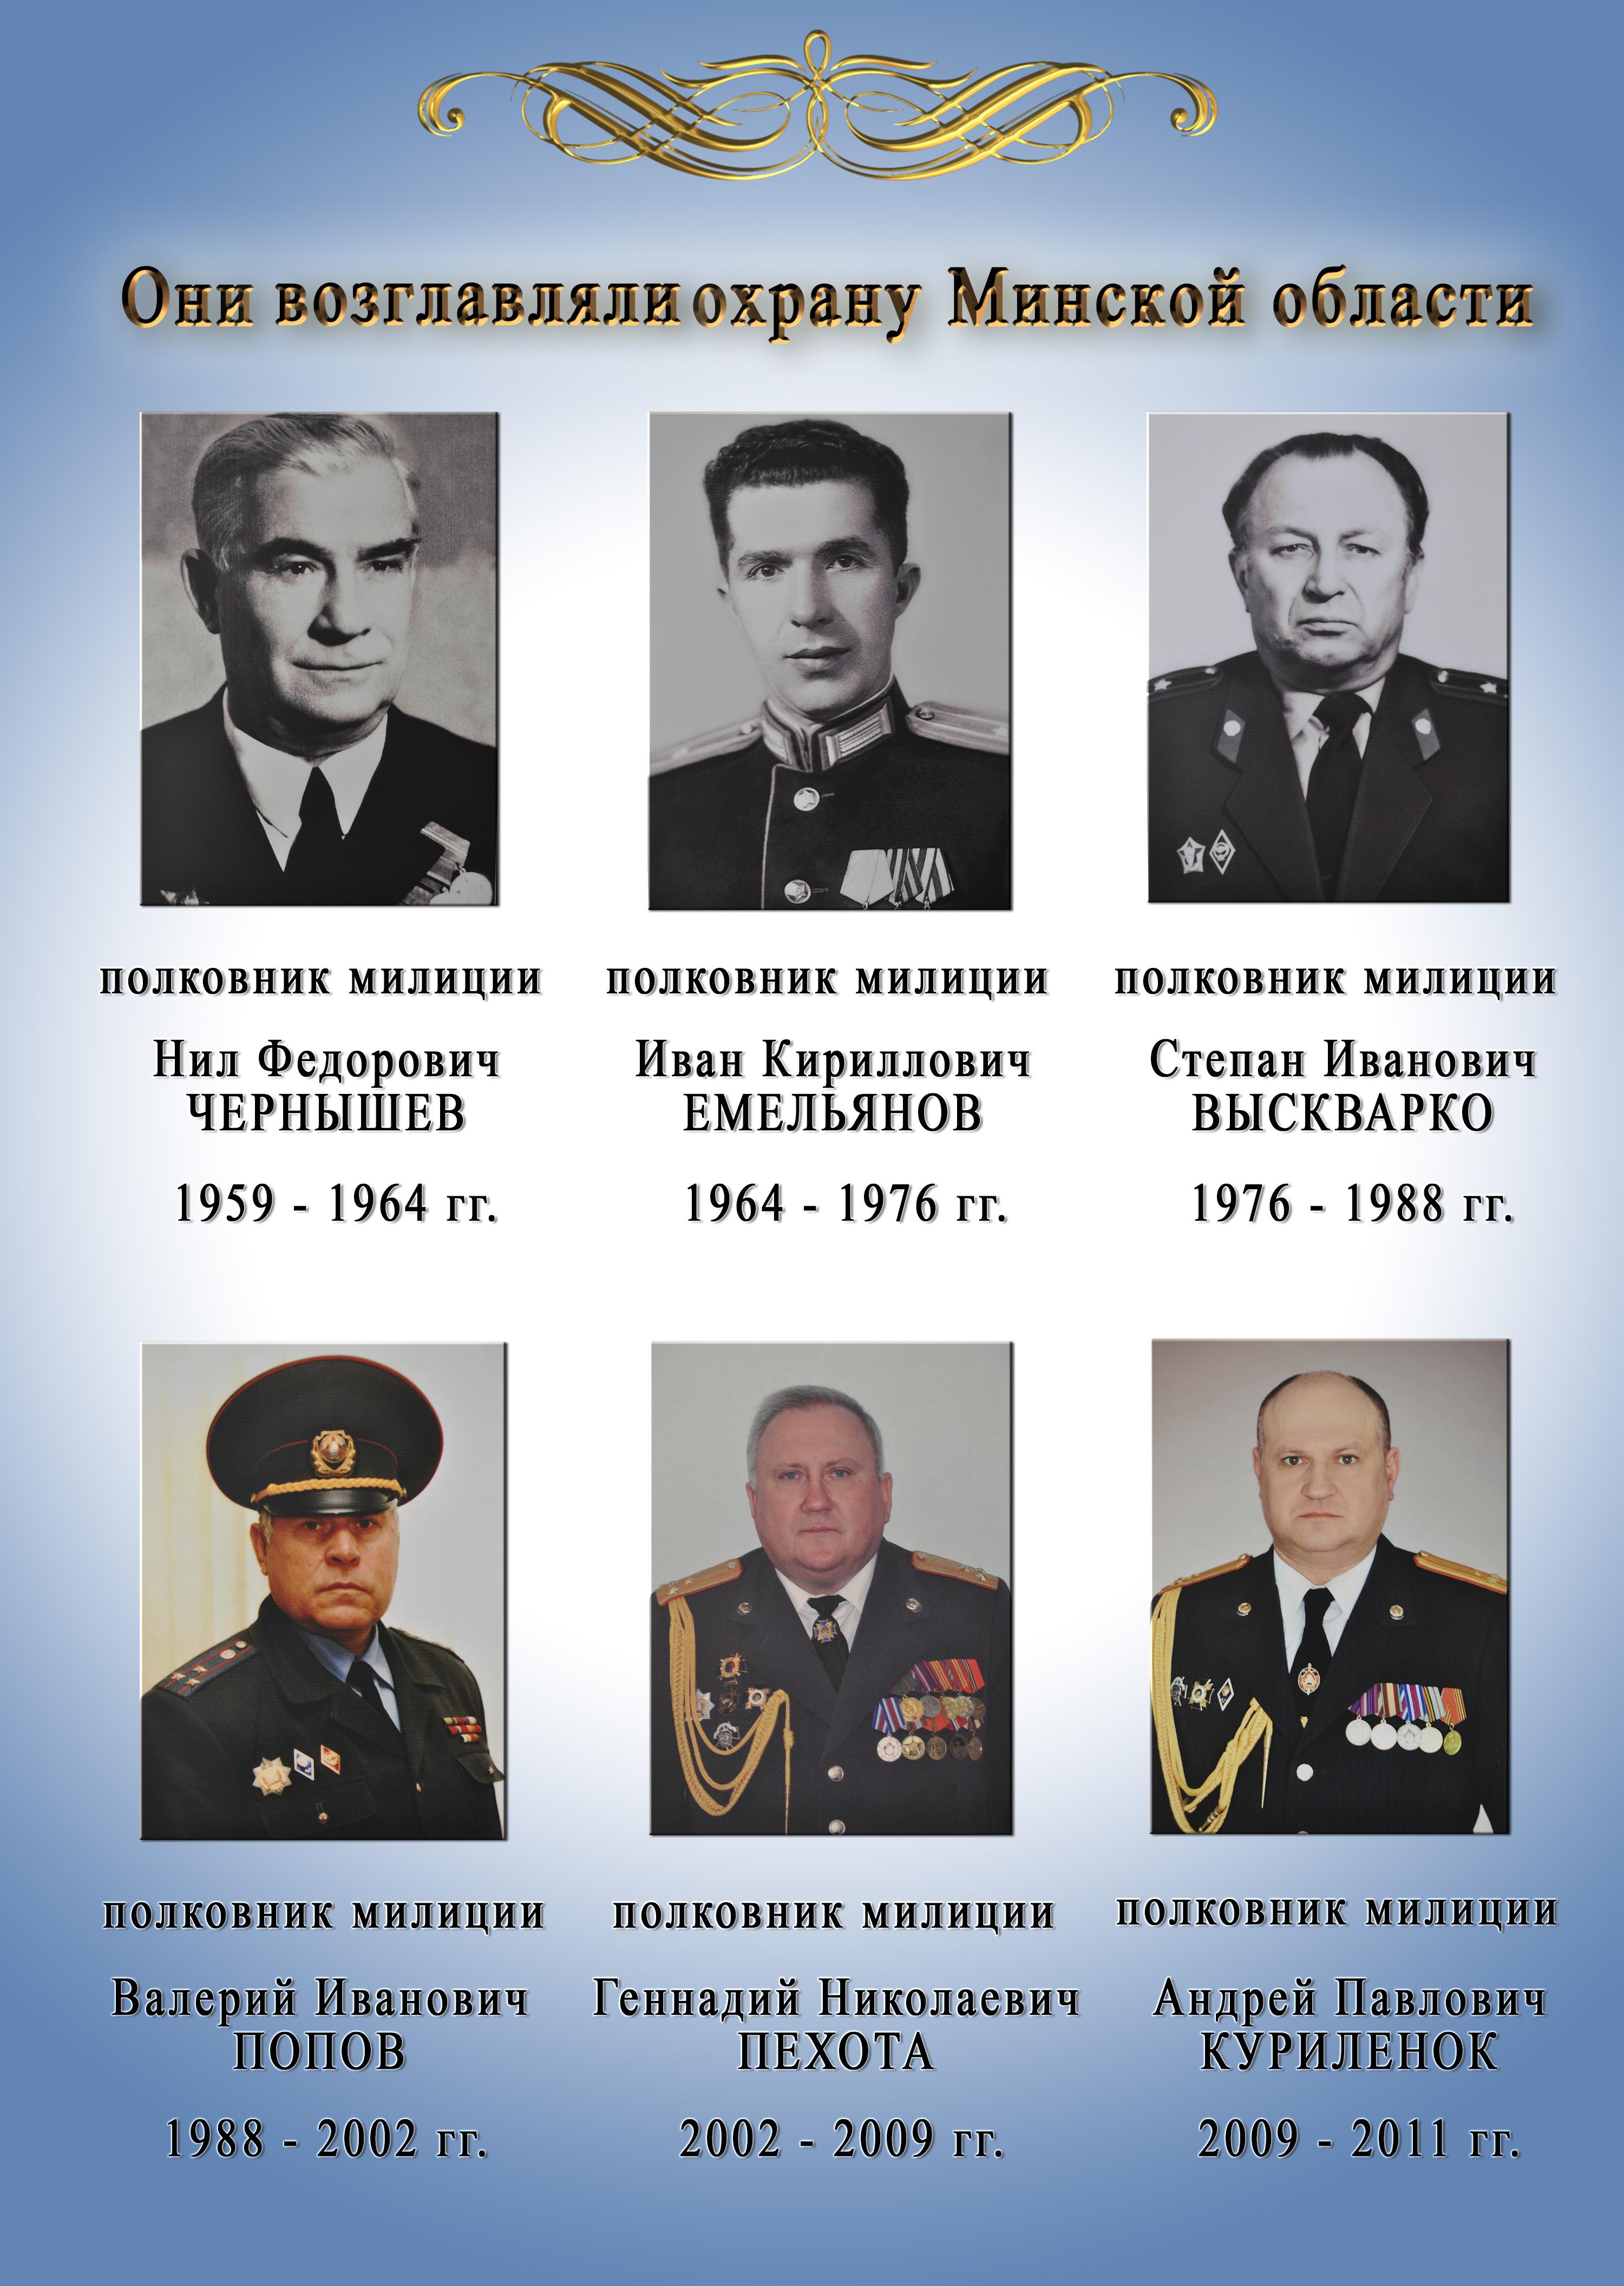 6-они руководили службой